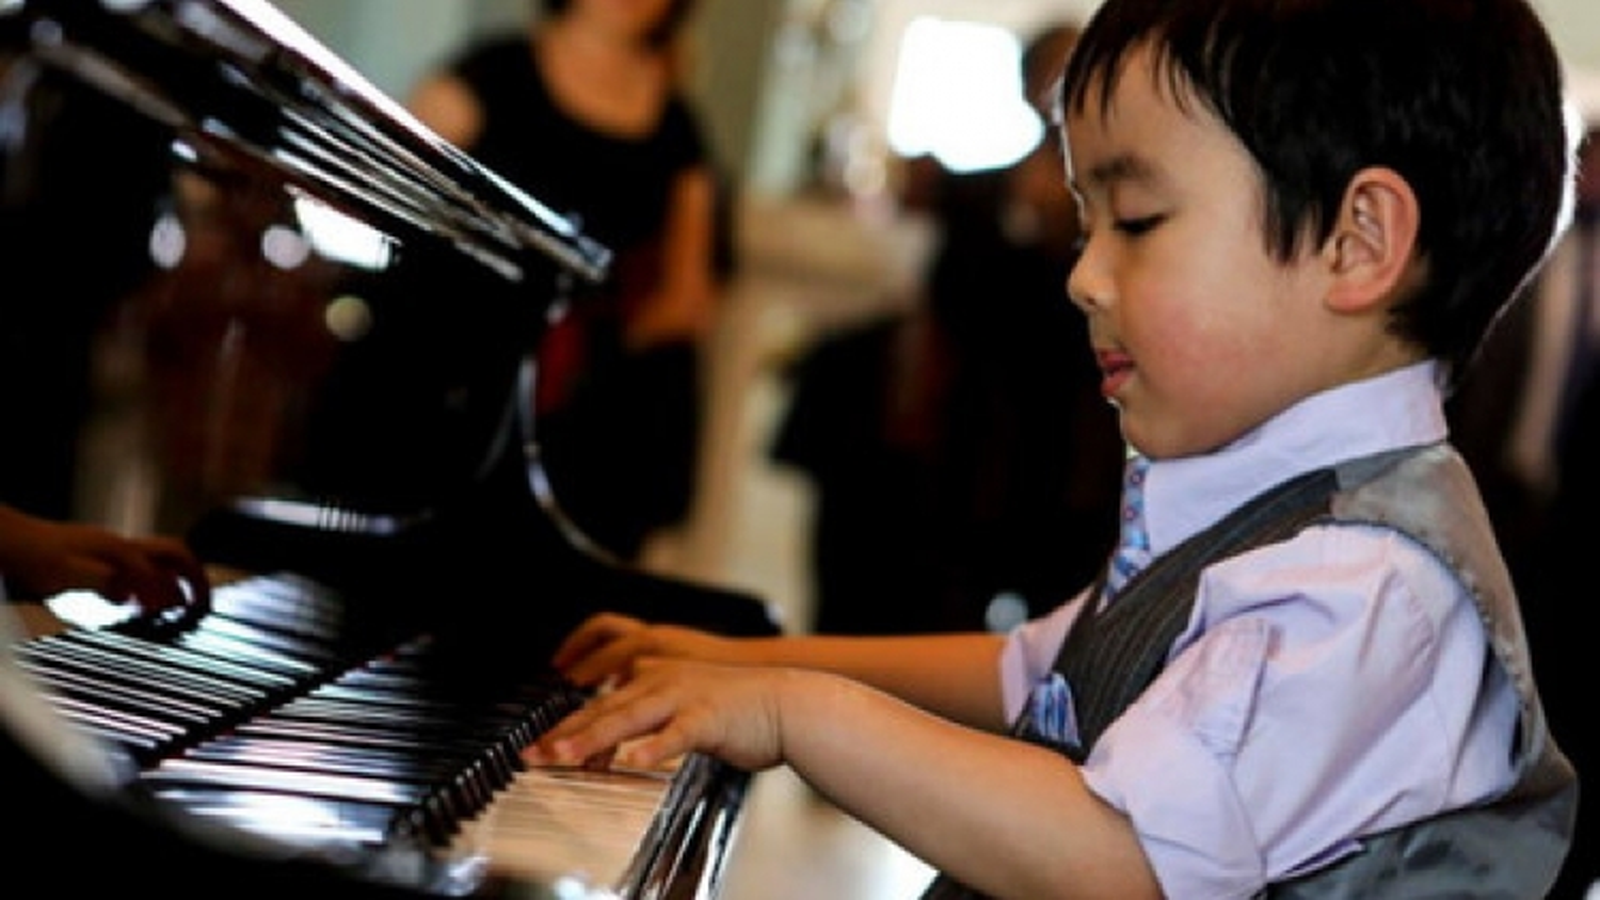 5-year-old piano prodigy to stun Vietnamese audiences